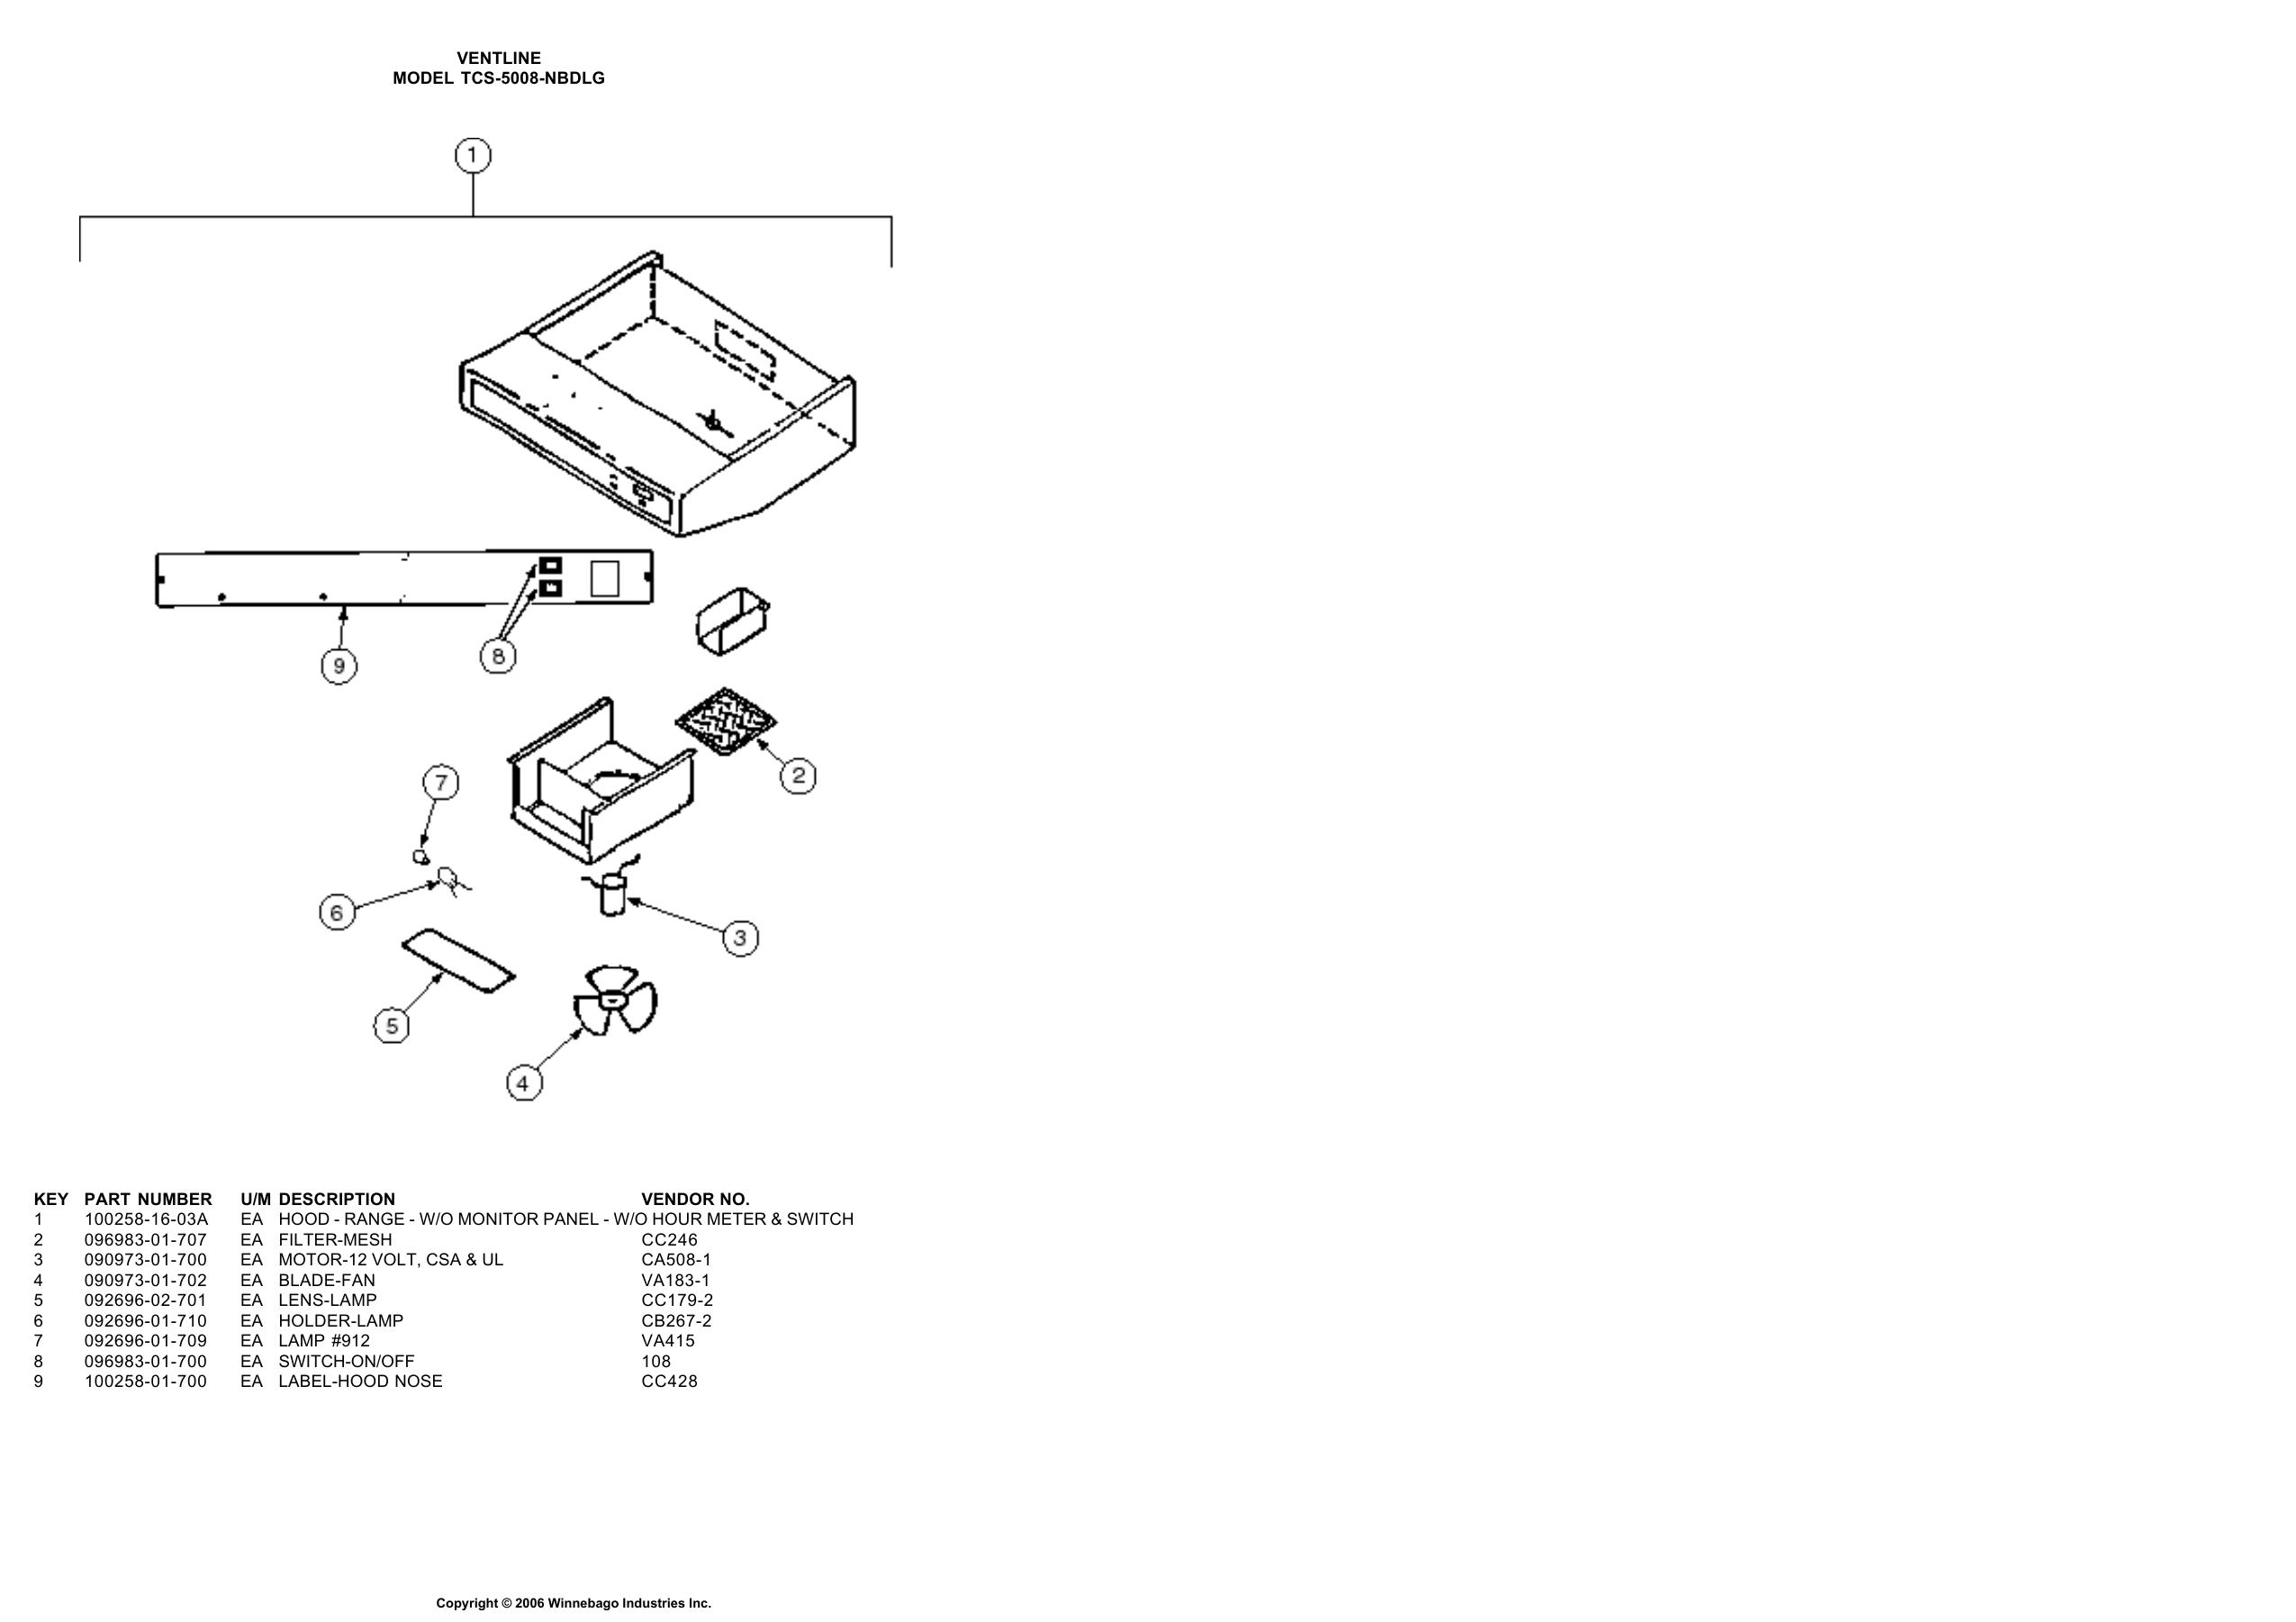 1998 Monitor Hood Panel Service Parts Catalog Ventline Wiring Diagram